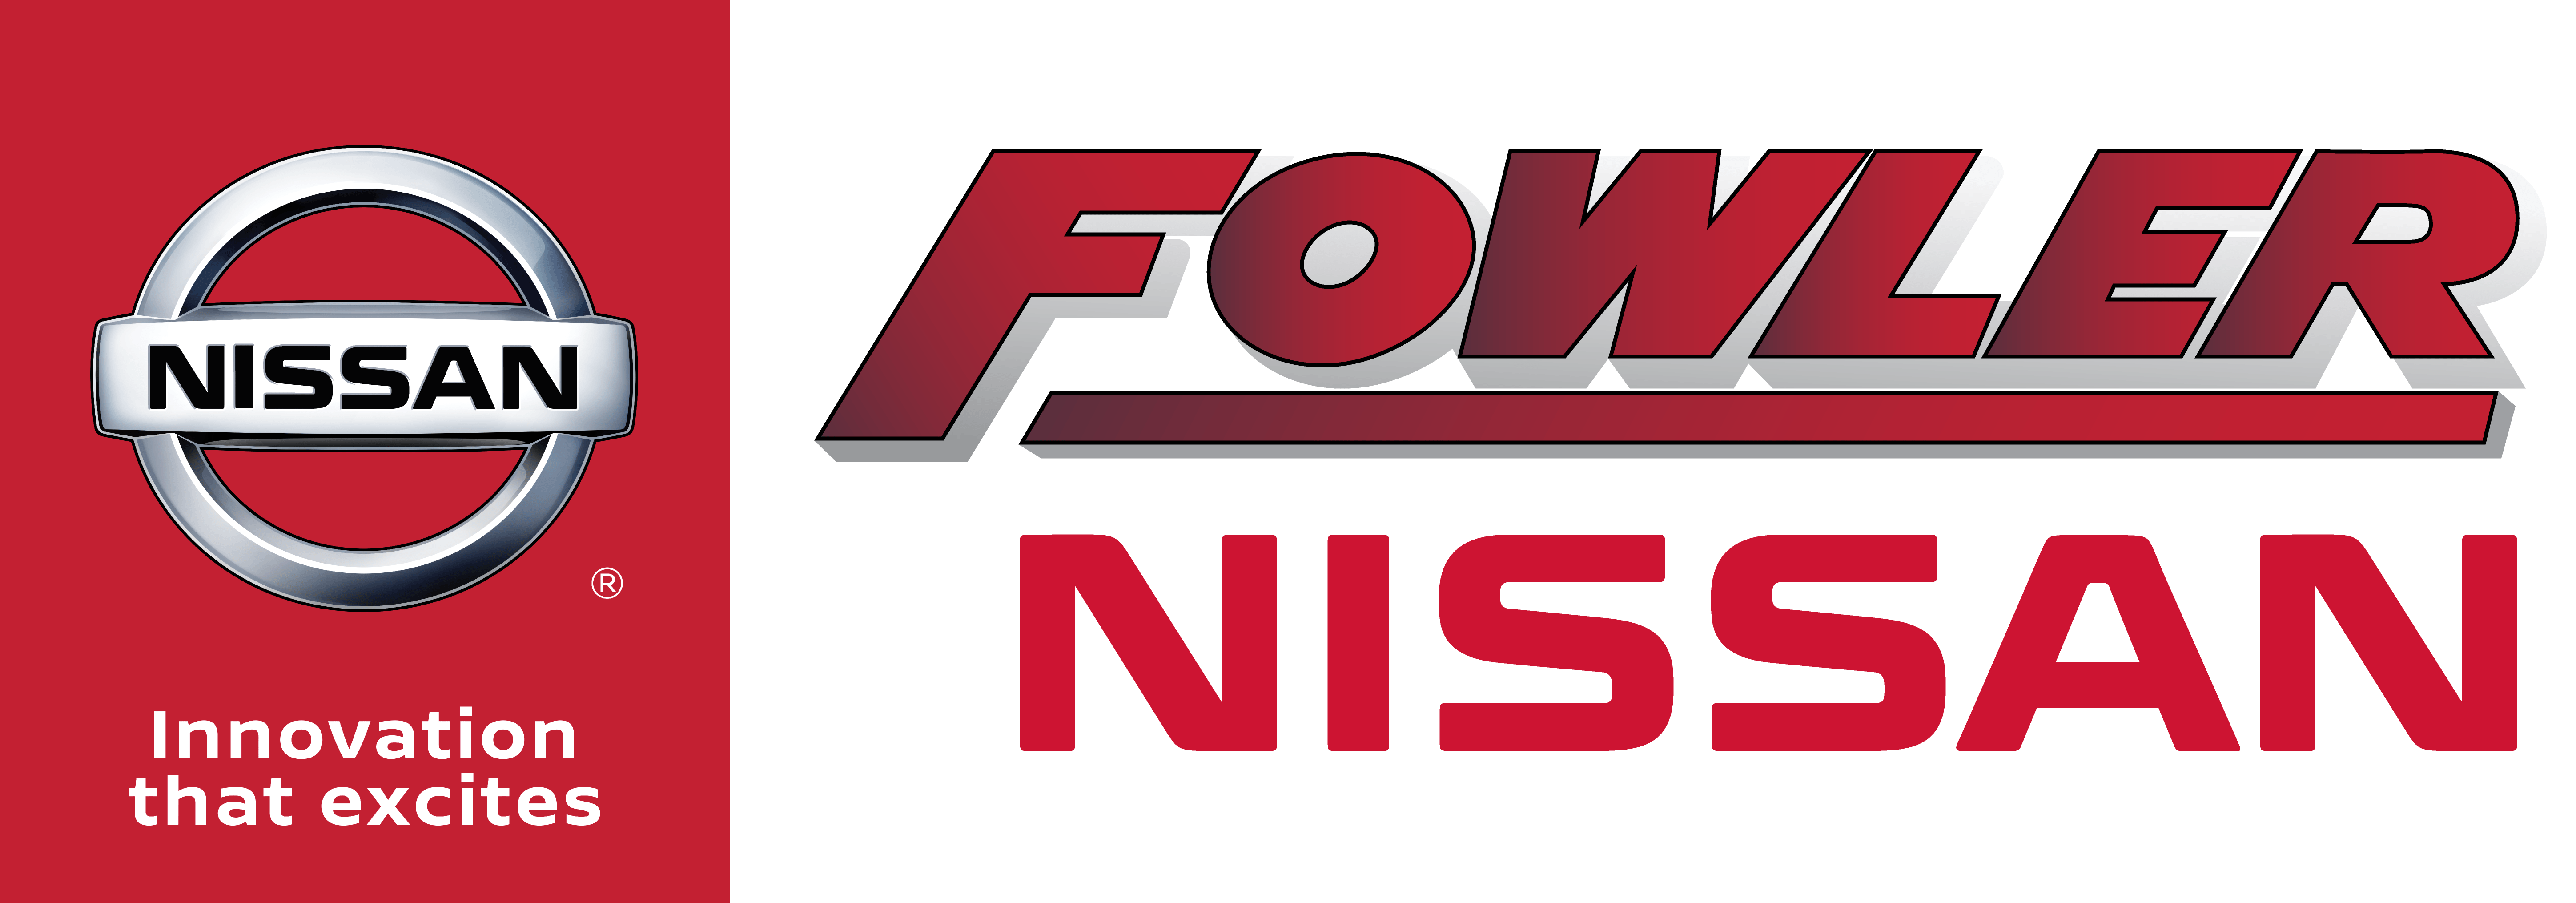 Fowler-Nissan-logo_Colour-v1-1.png